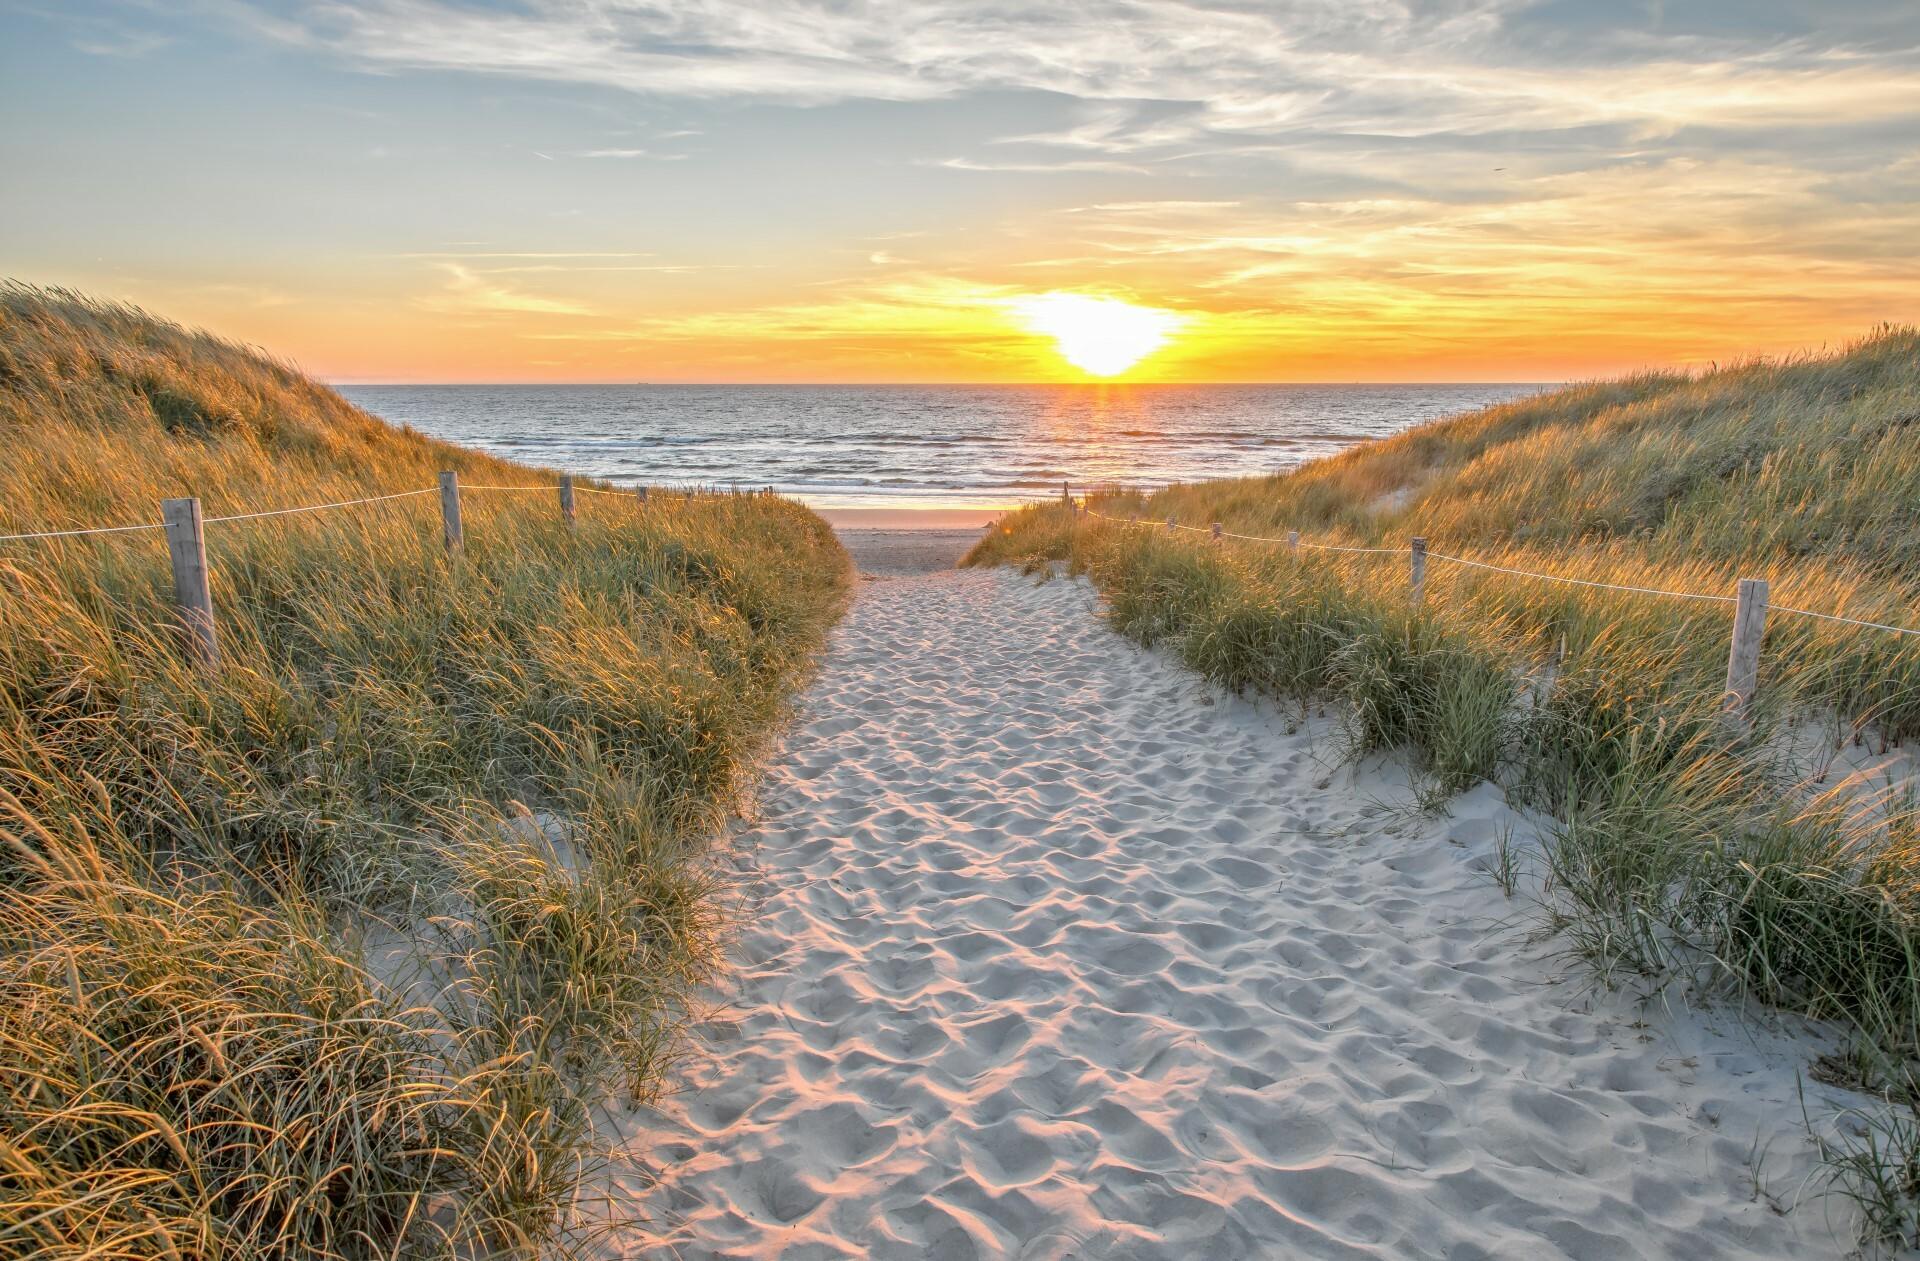 Strandopgang met de zonsondergang VVV Texel fotograaf Justin Sinner